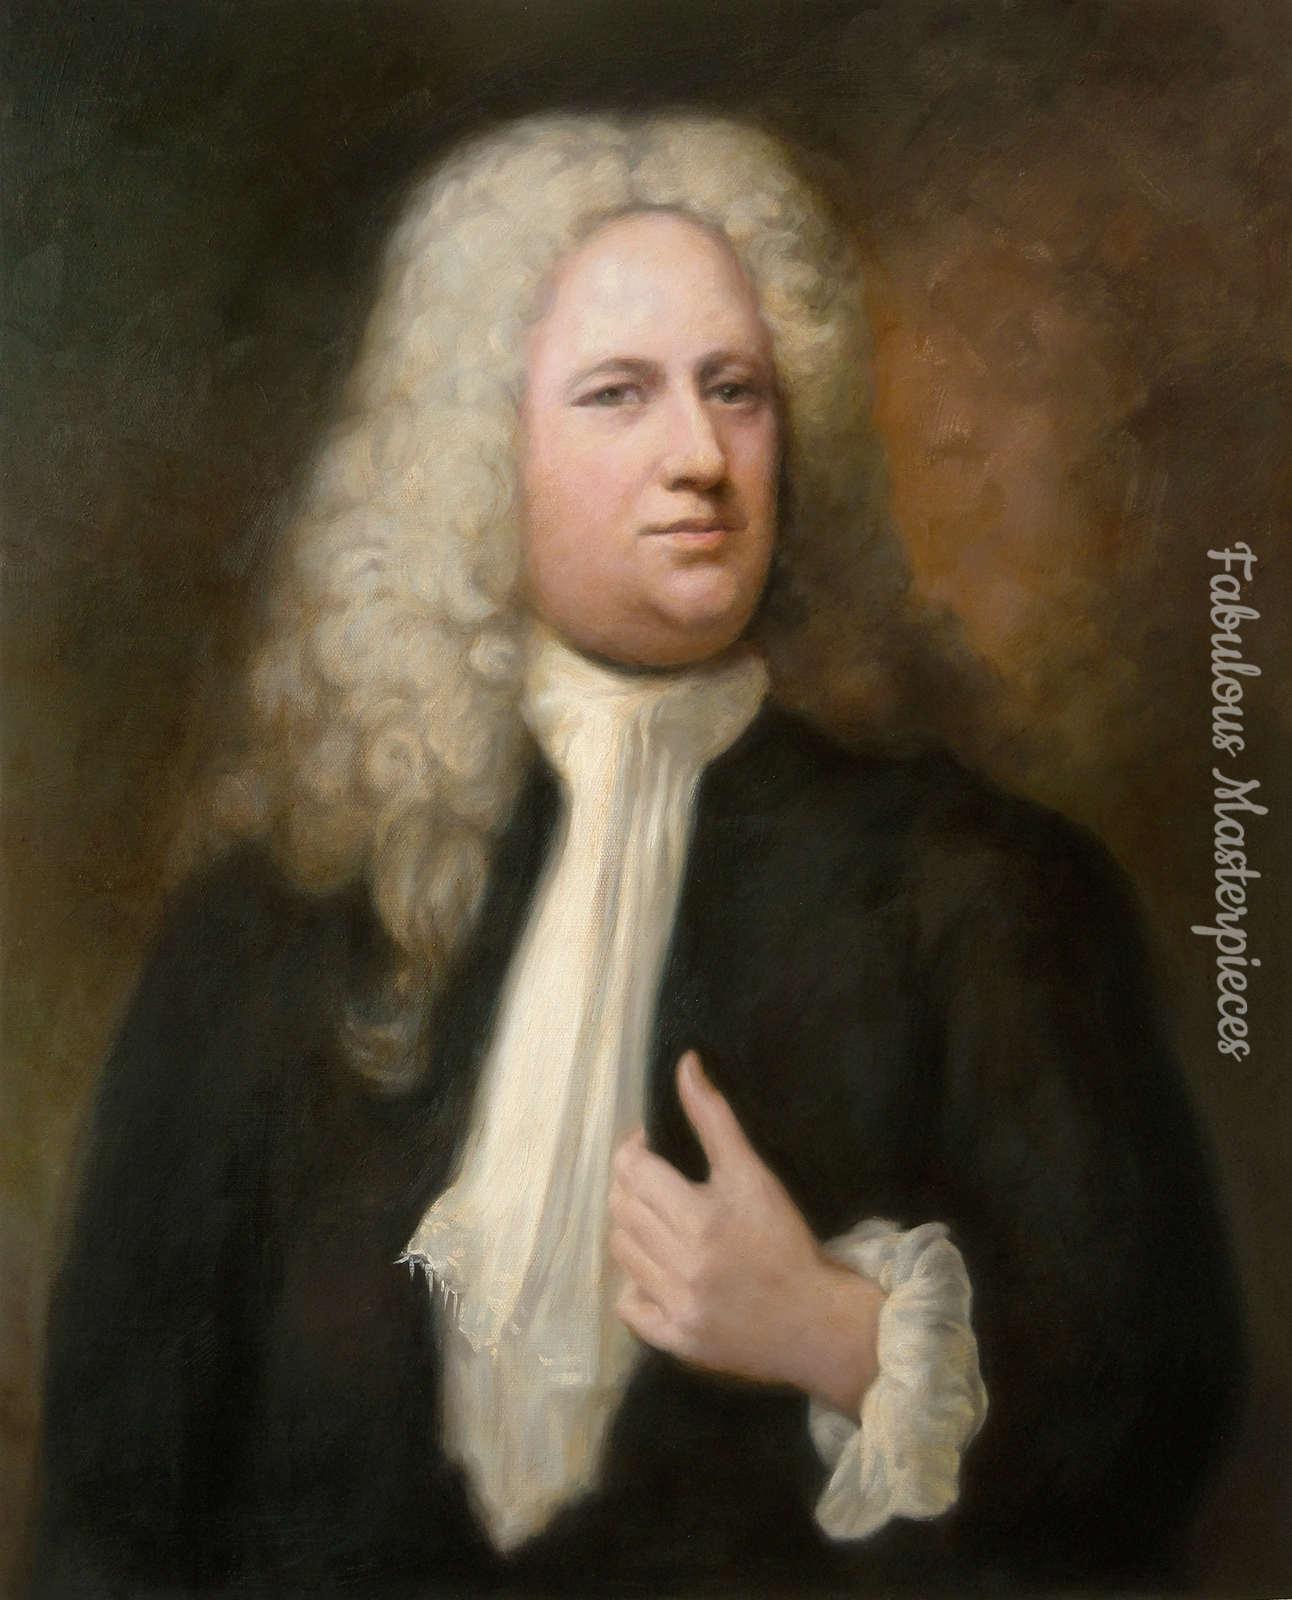 Handel composer portrait